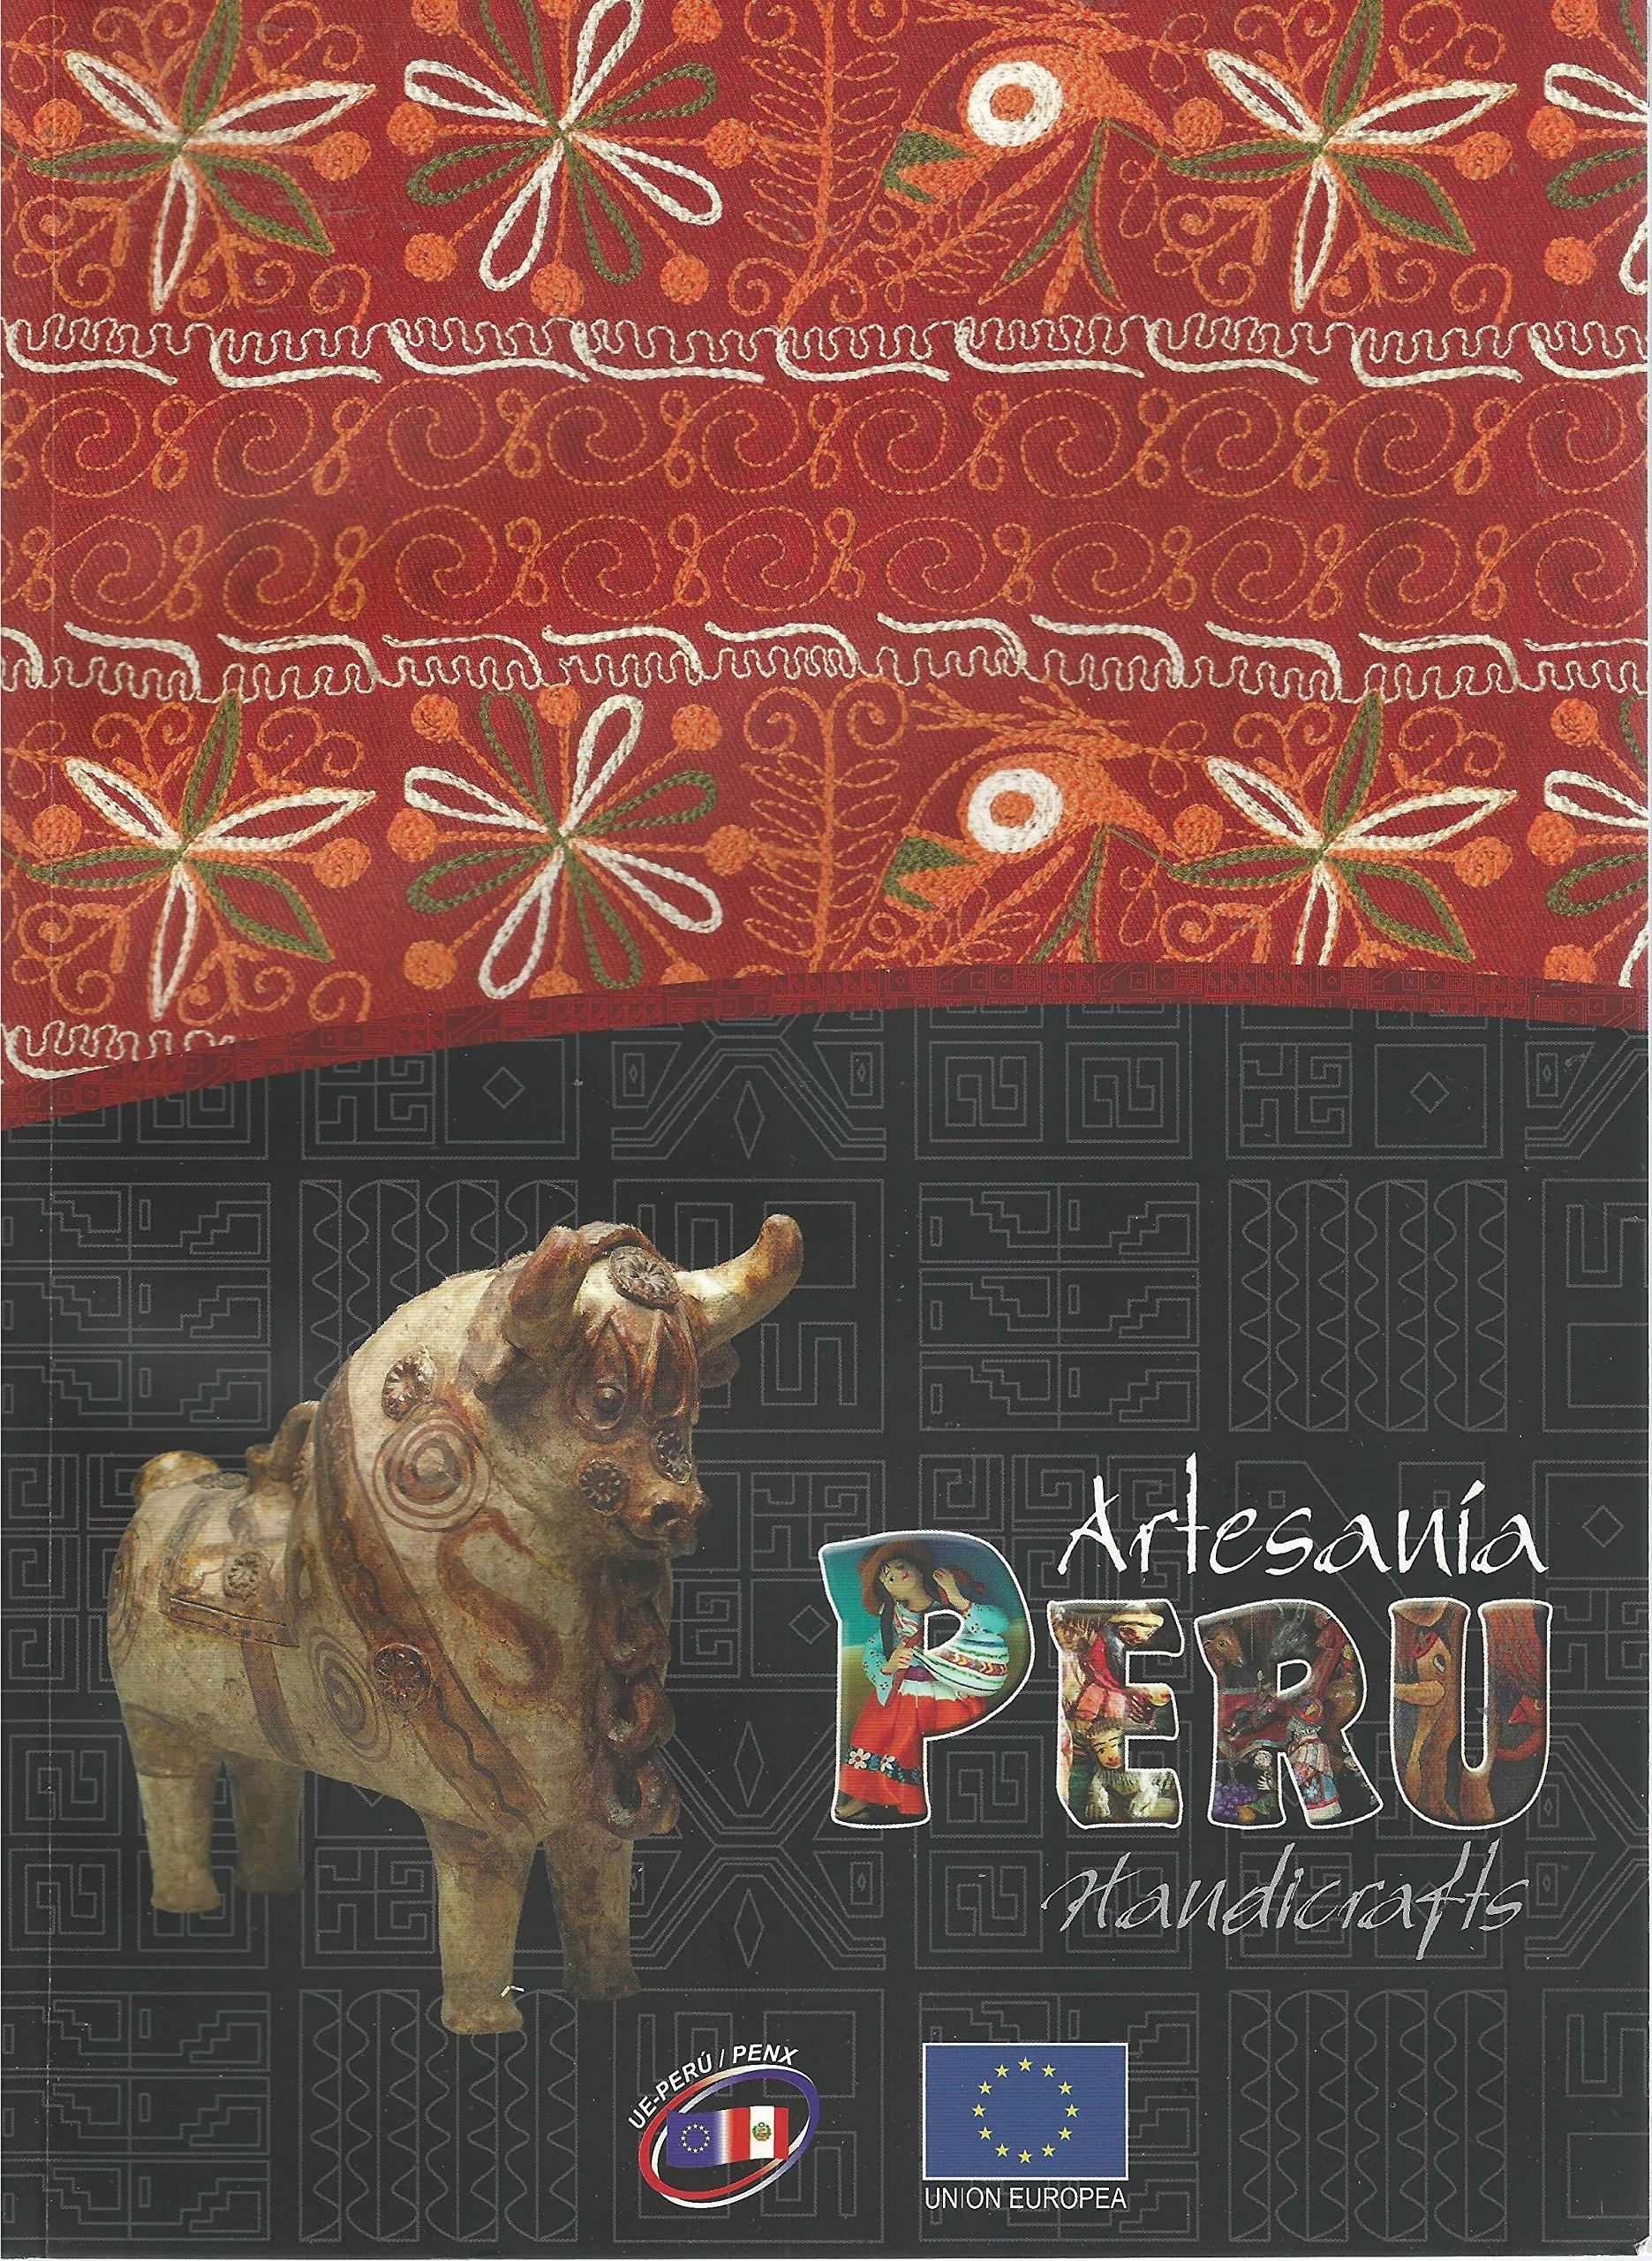 Artesania Peru Handicrafts Englishspanish Mercedes Araoz